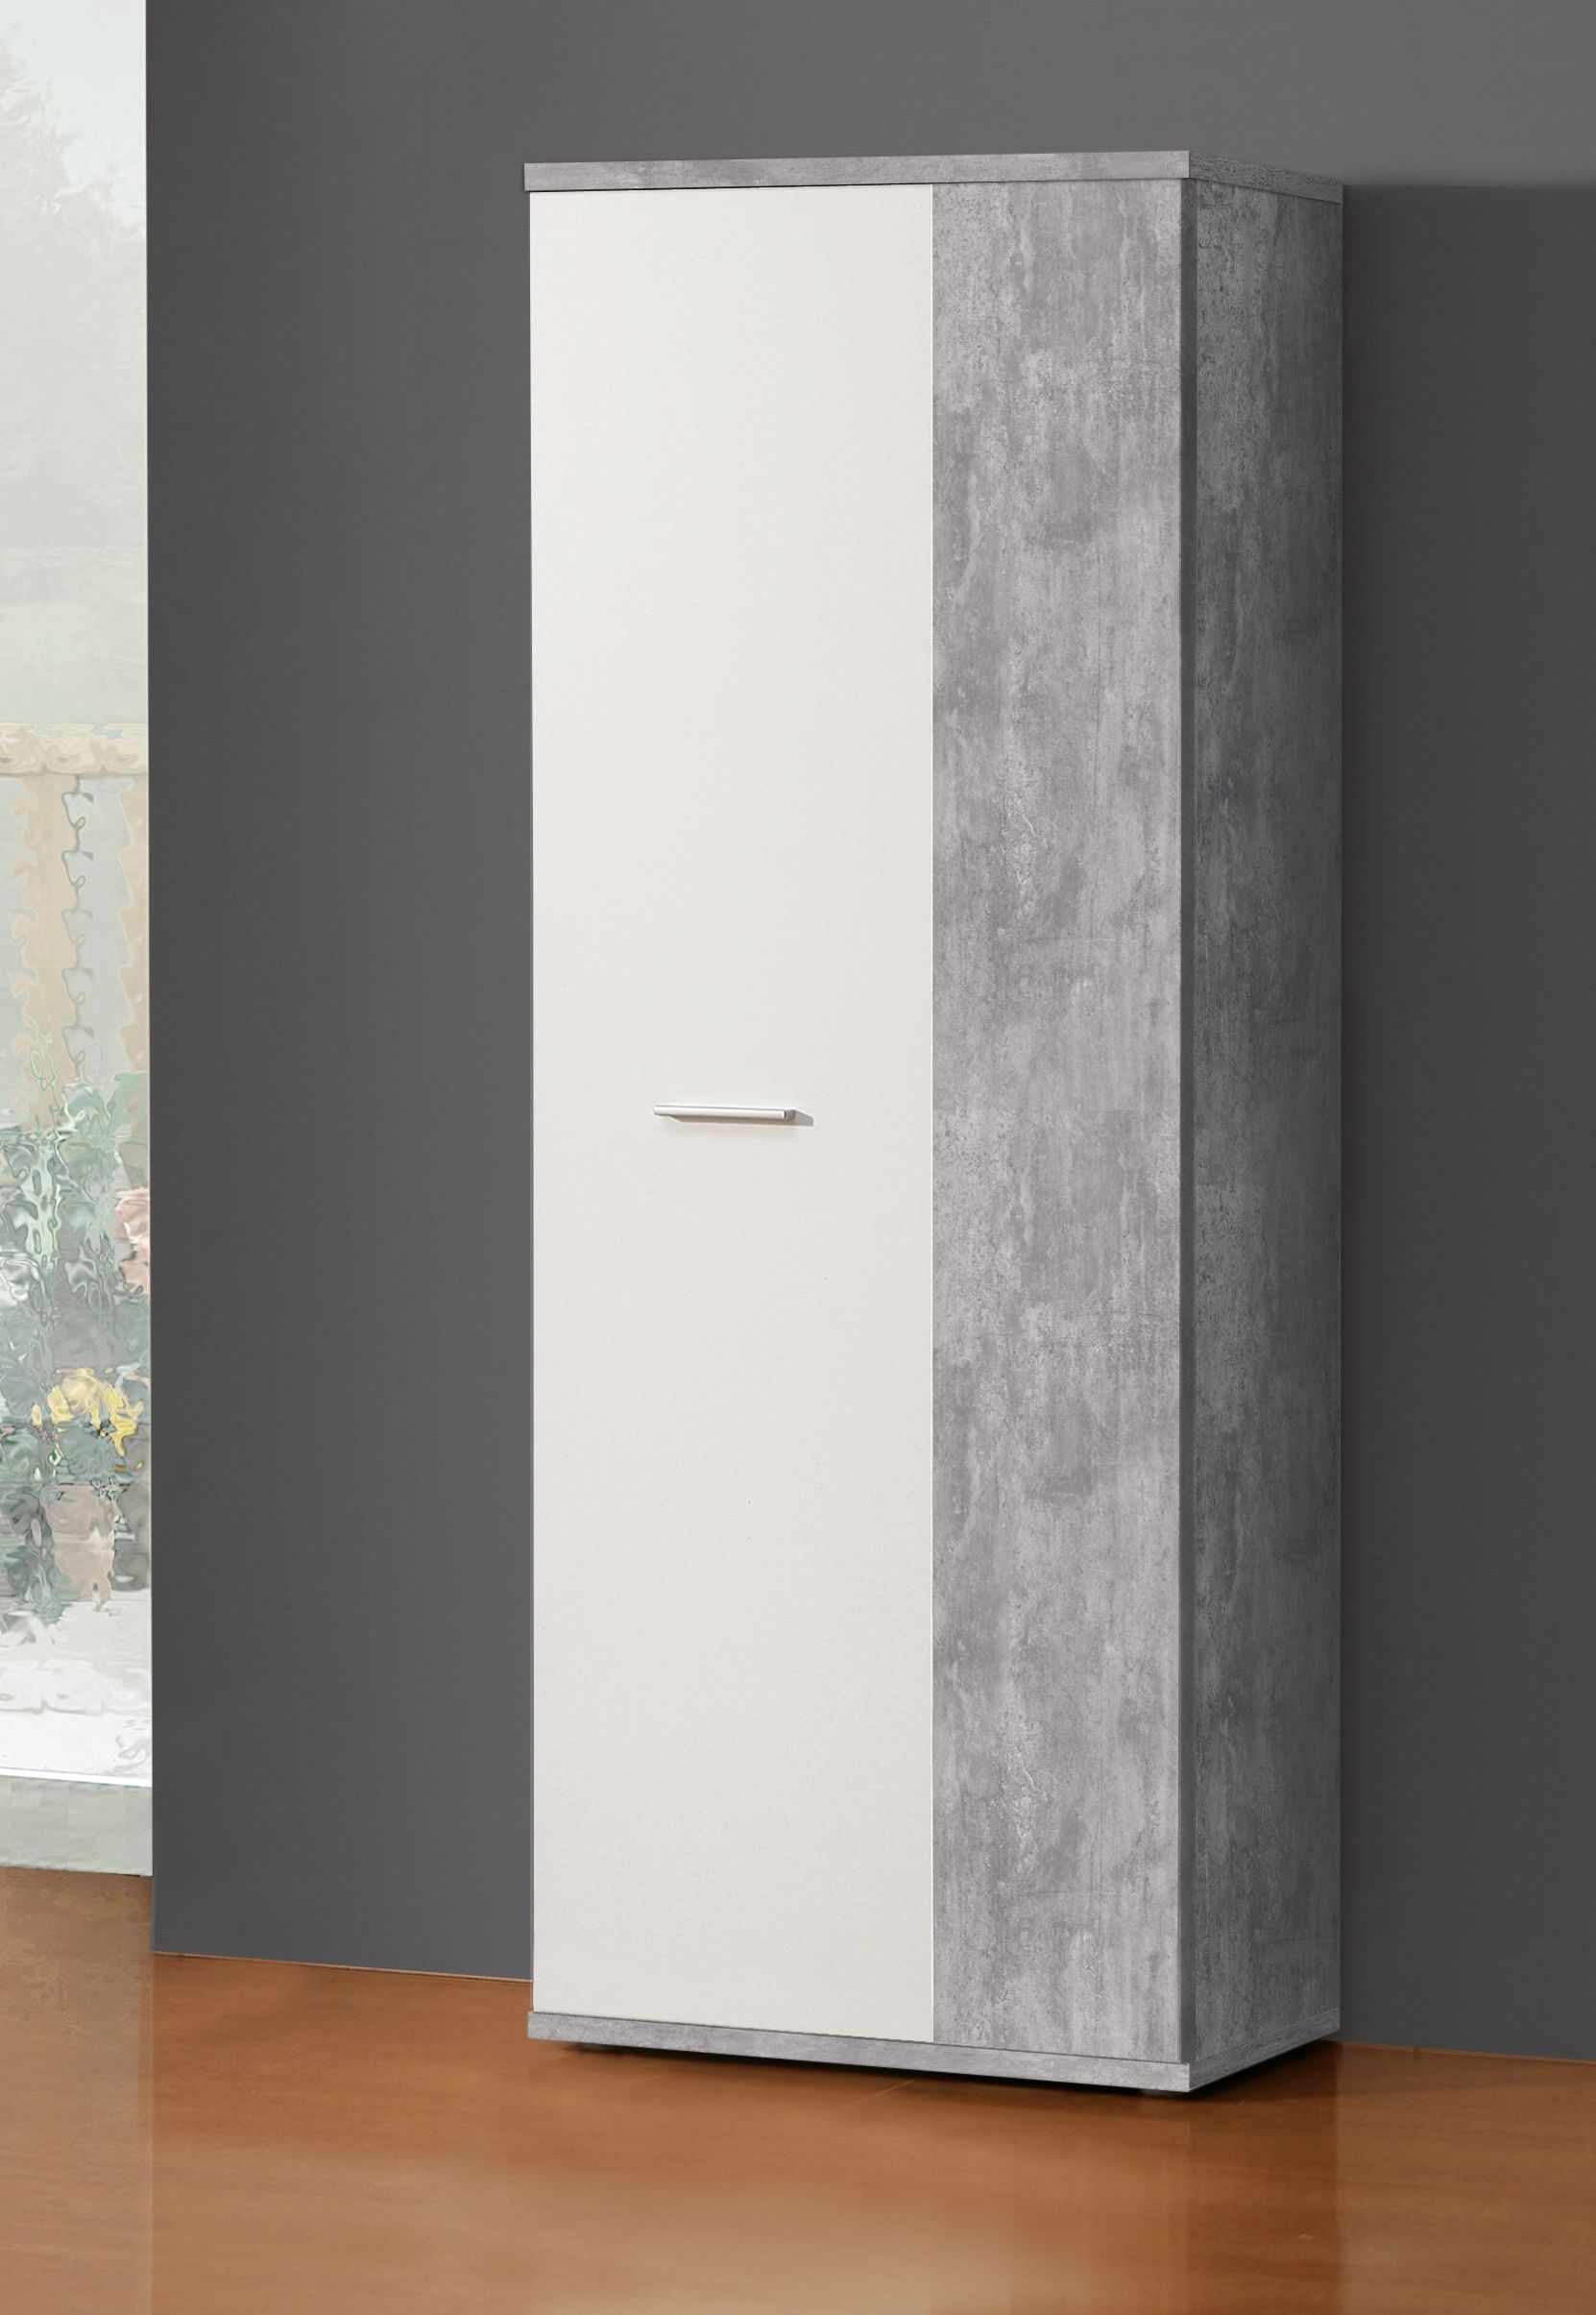 schuhschrank net 106 kleinm bel garderoben sortiment. Black Bedroom Furniture Sets. Home Design Ideas